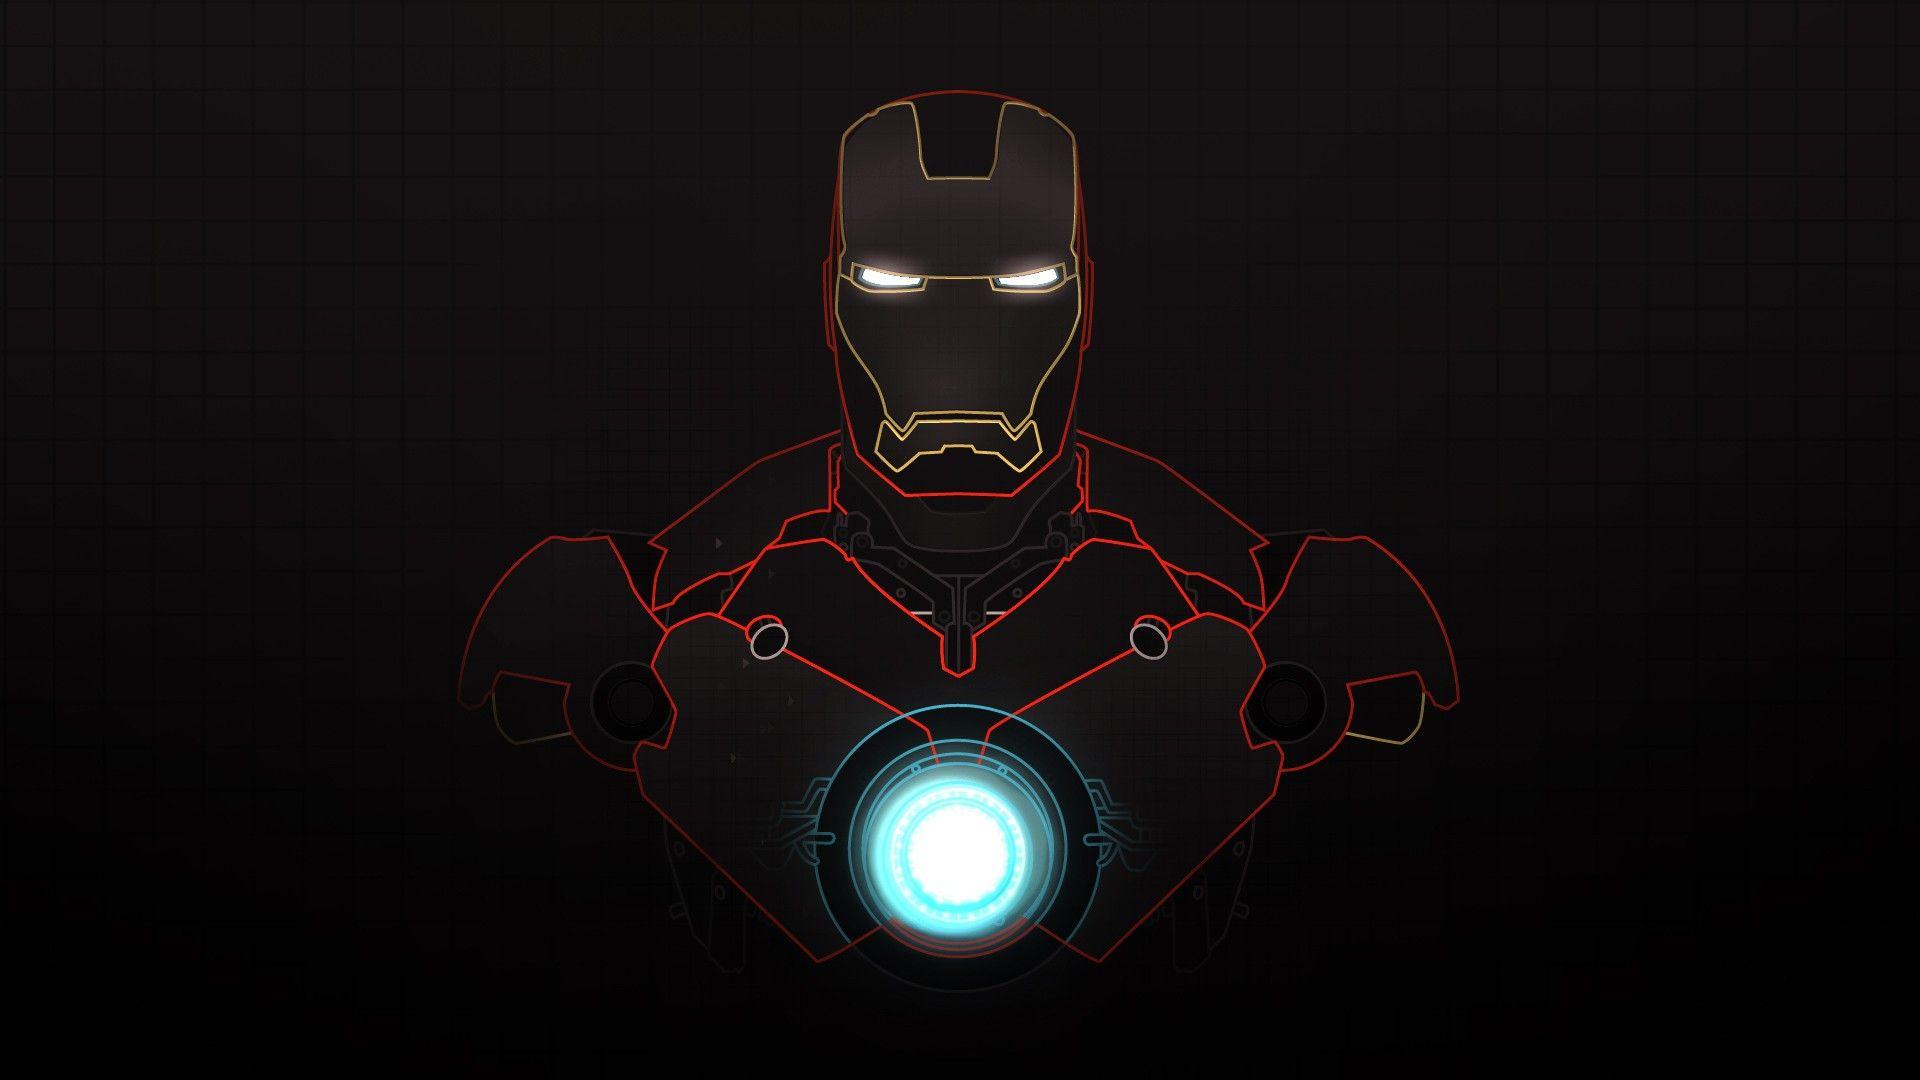 Superheroes Minimalistic Hi Res Wallpapers Iron Man Hd Wallpaper Iron Man Wallpaper Man Wallpaper